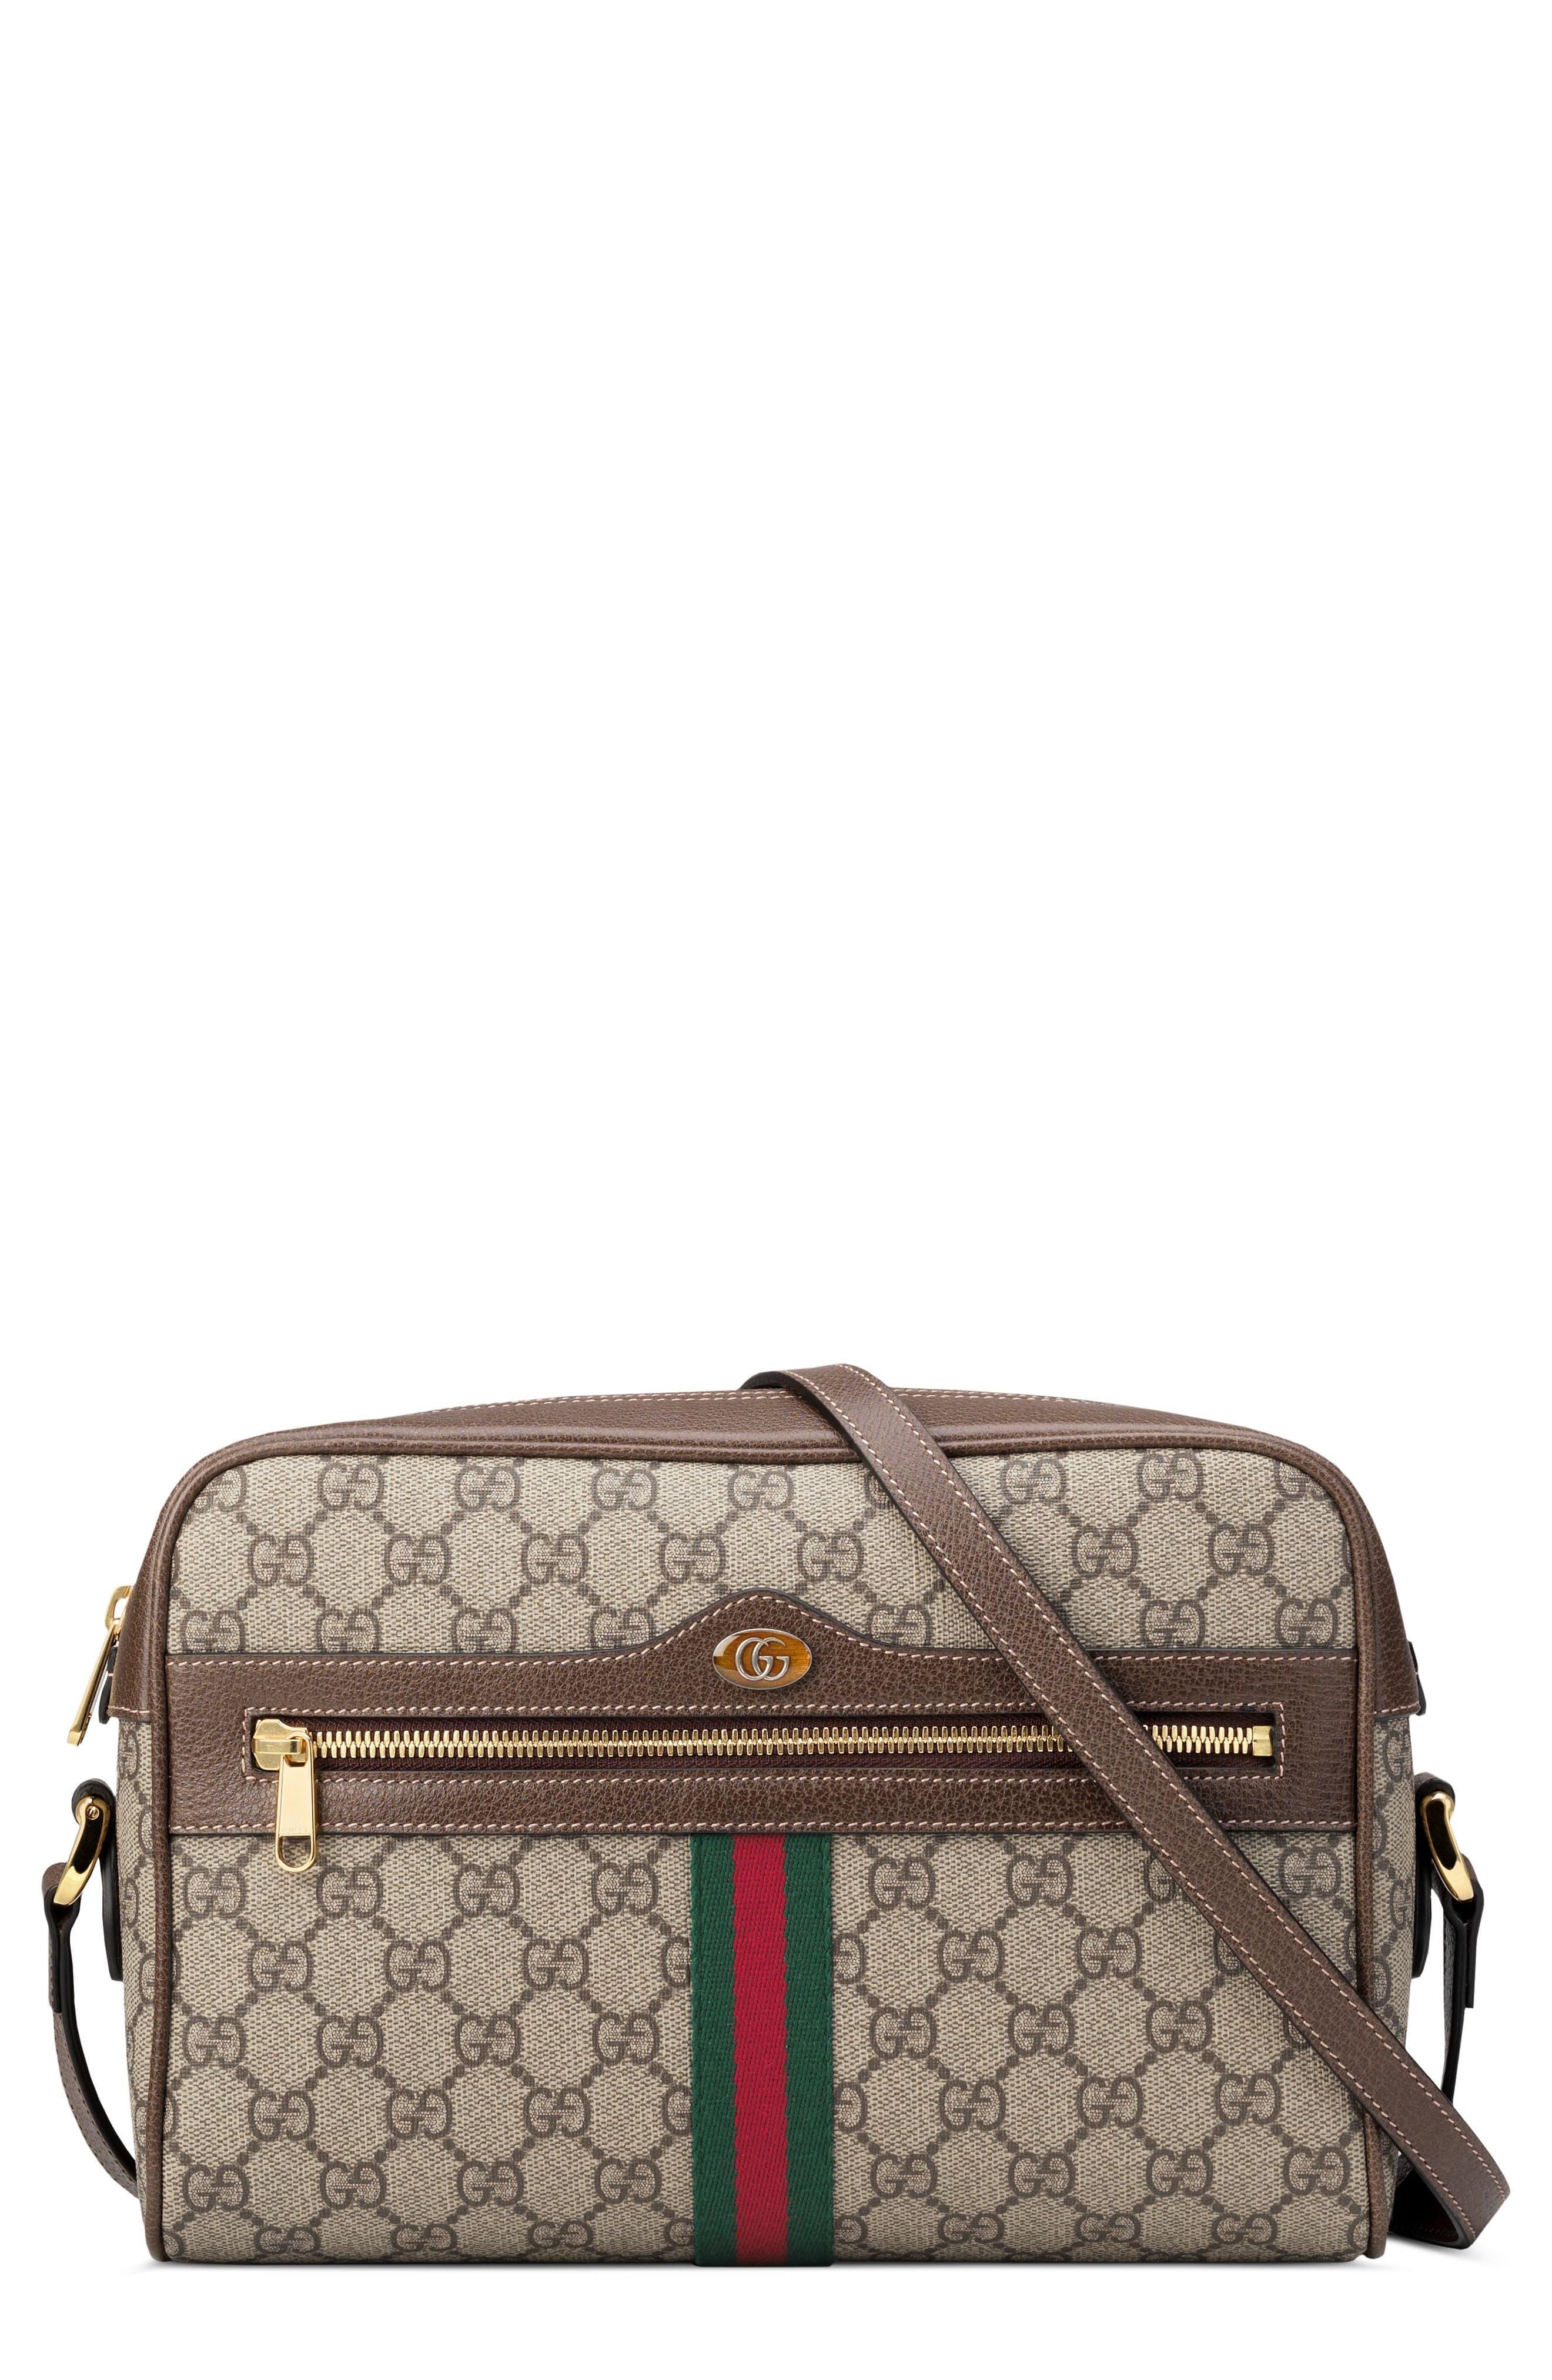 29a16fc18 Gucci. Women's Ophidia Gg Supreme Canvas Crossbody Bag -